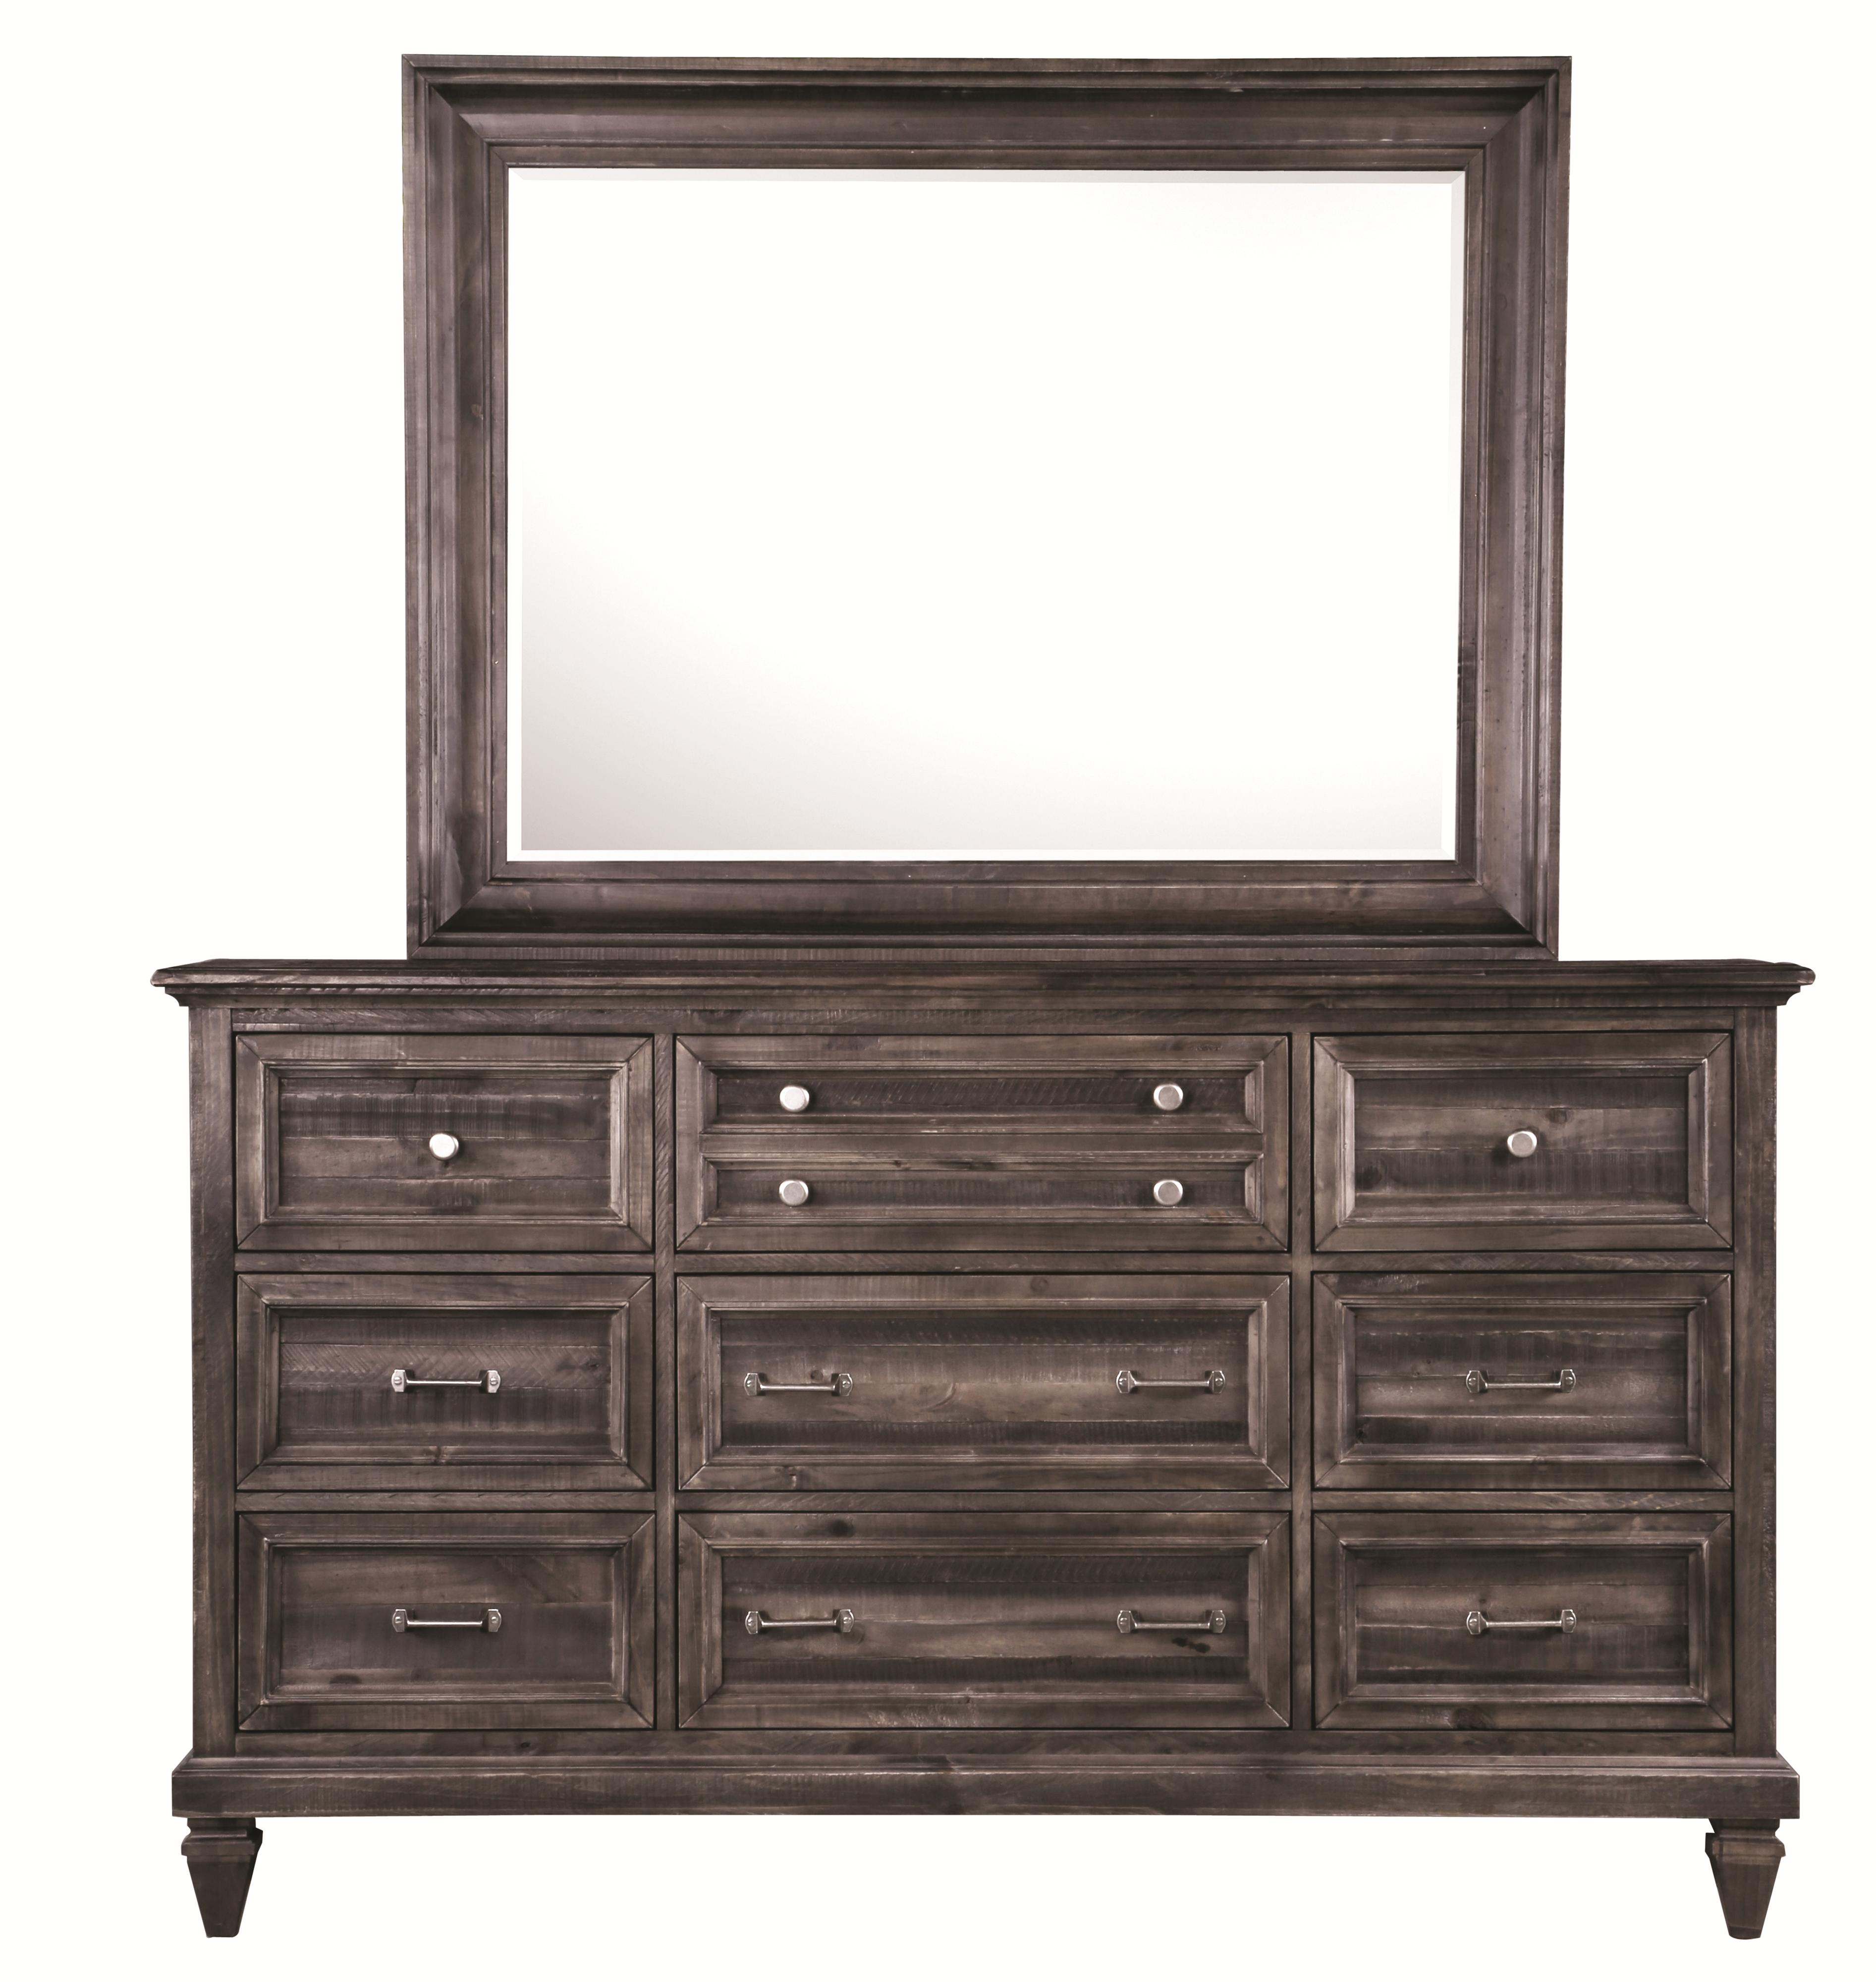 9-Drawer Dresser and Landscape Mirror Combination